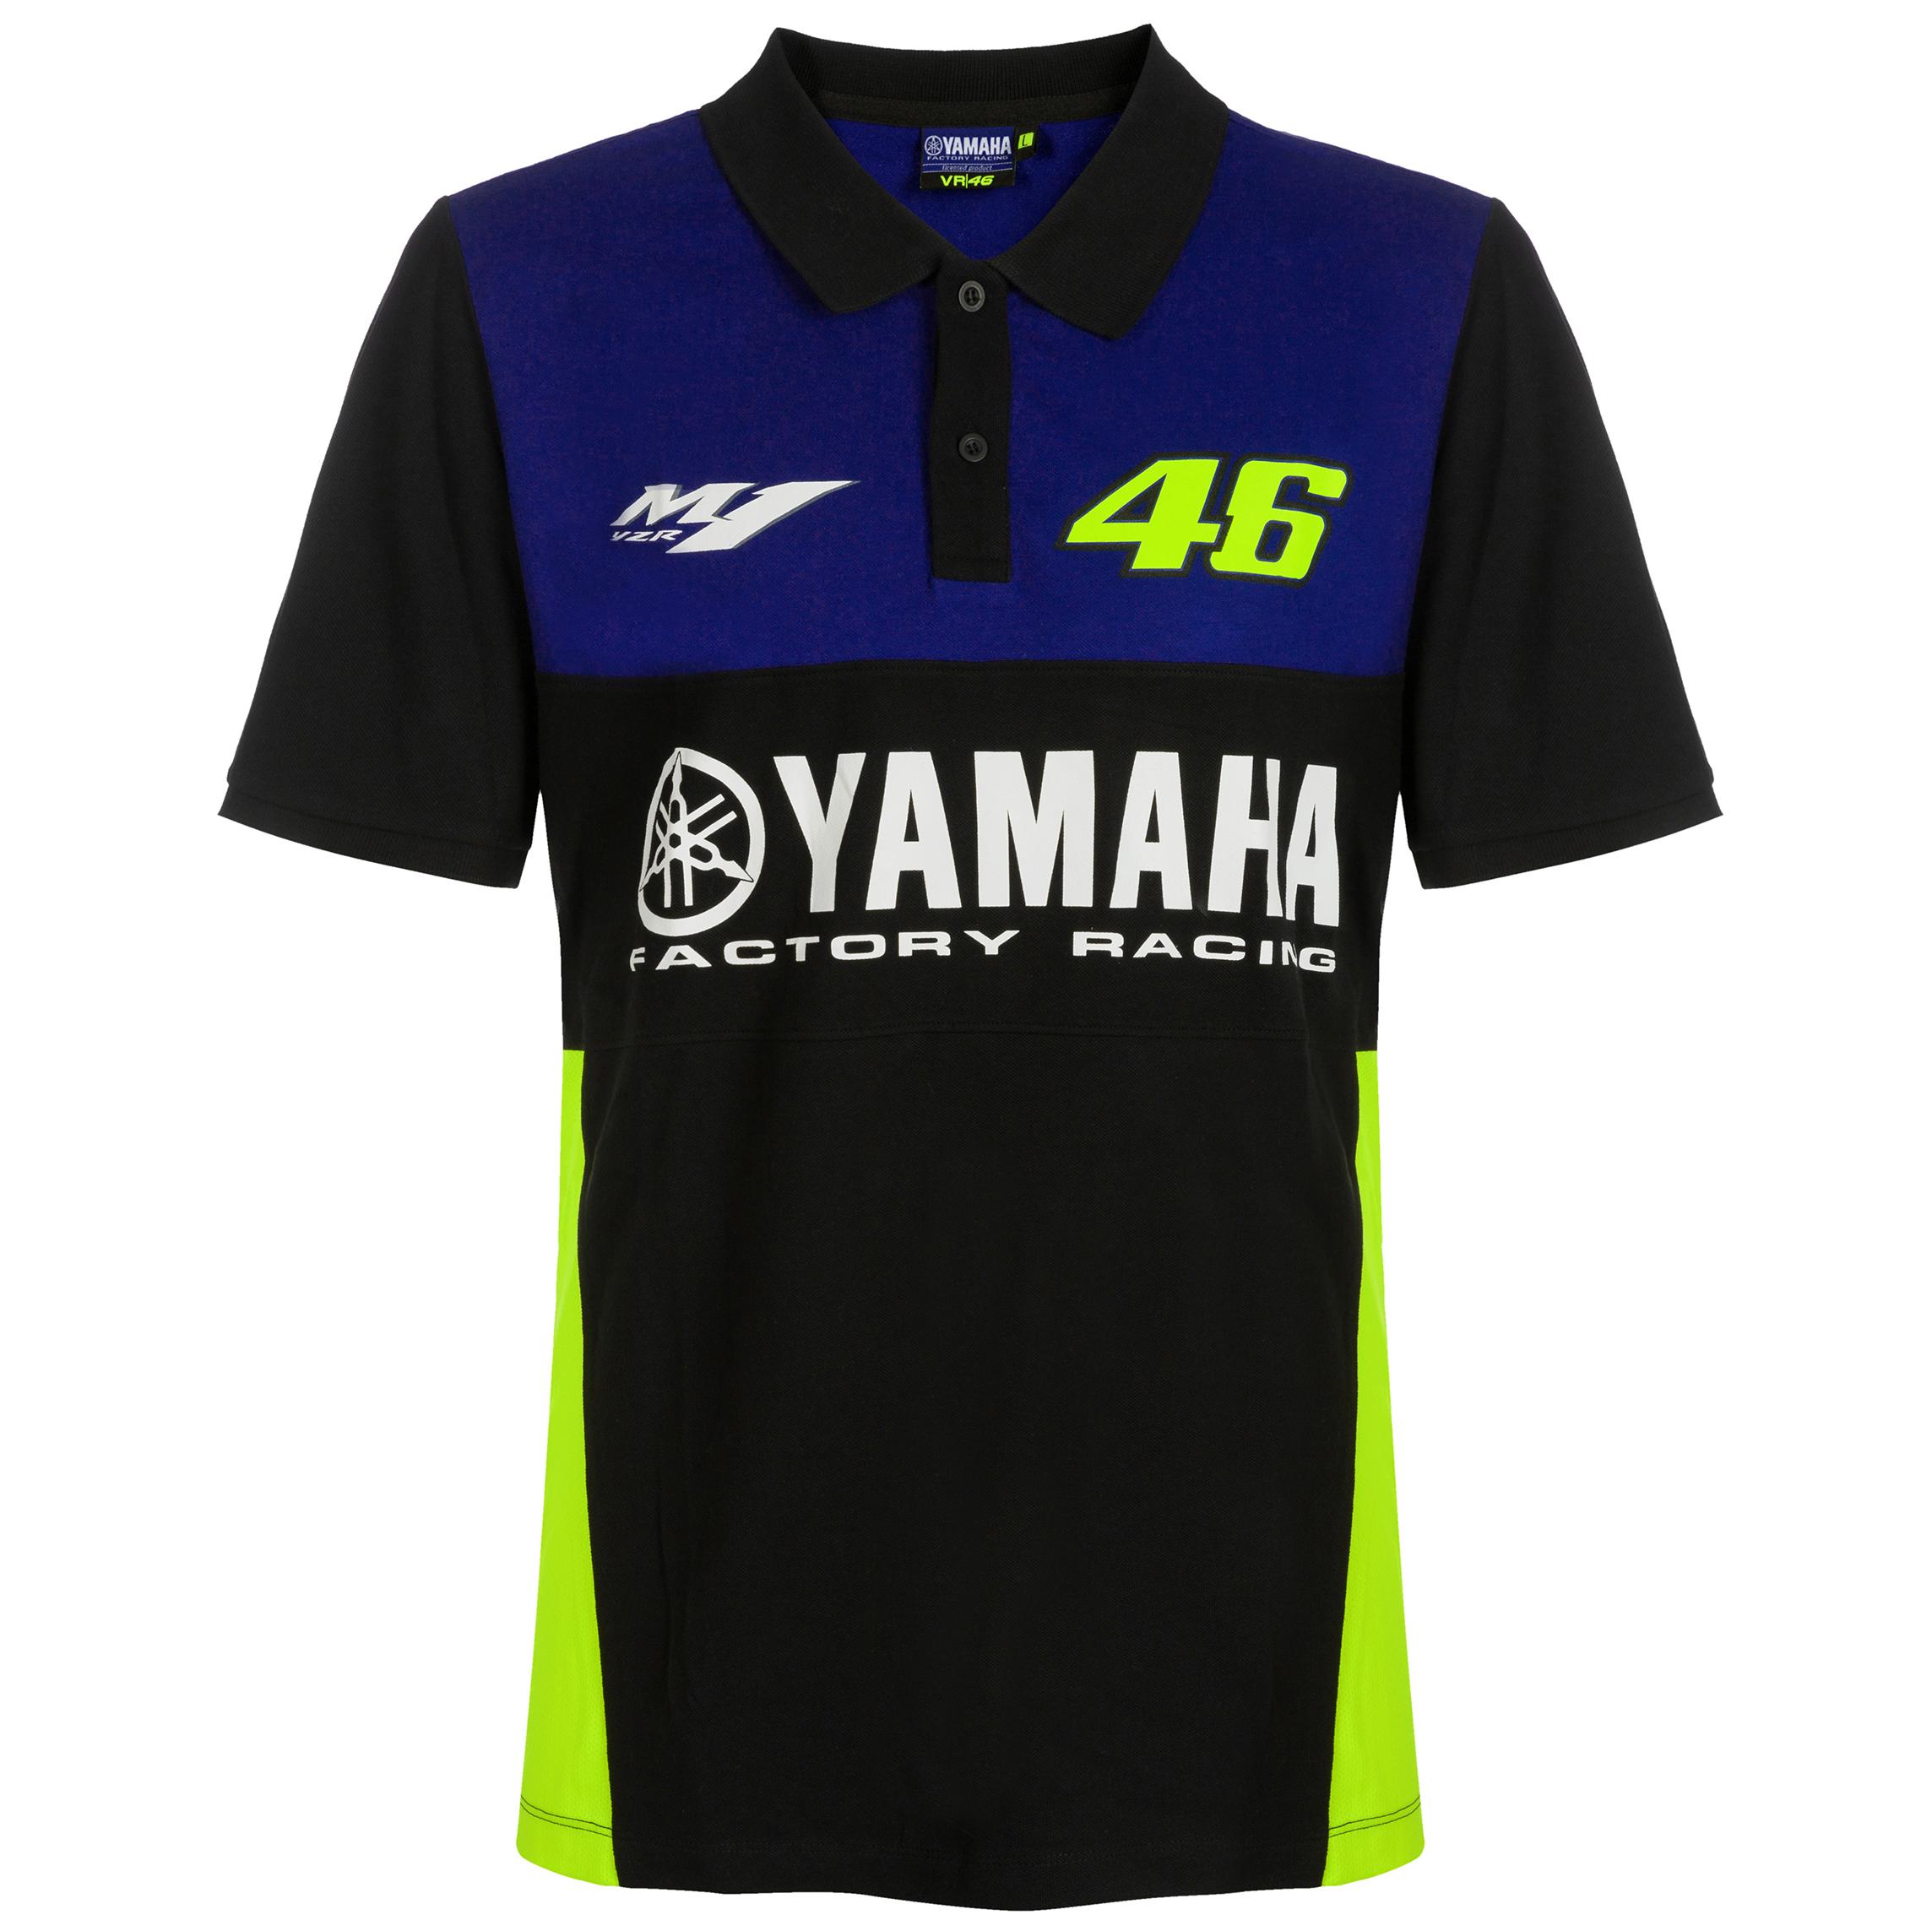 VALENTINO ROSSI VR46 Moto GP M1 Yamaha Racing Team Sweat /à Capuche Officiel 2018